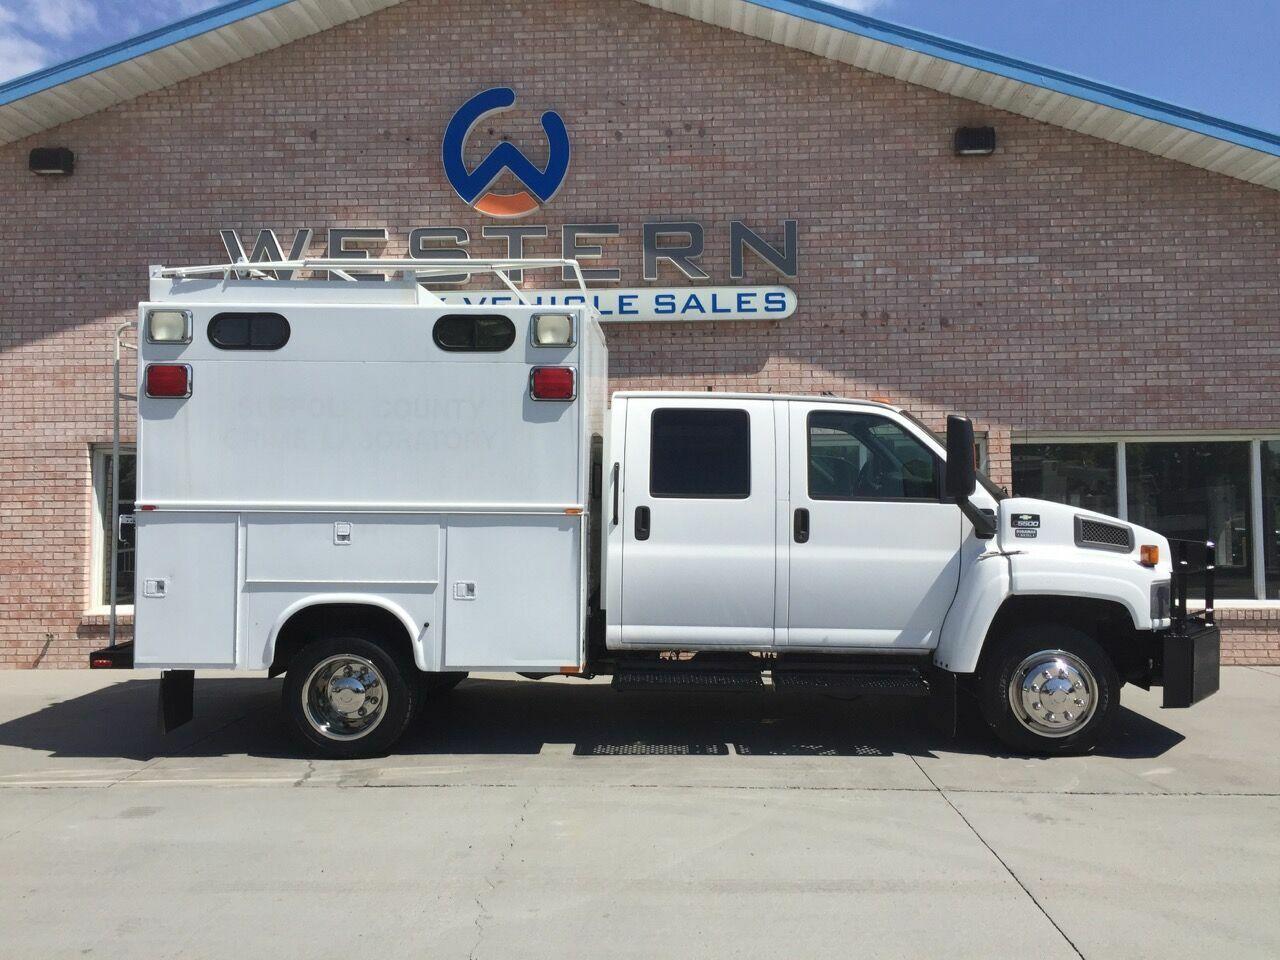 2007 Chevrolet C5500 Crew Cab Service Truck LOW MILES